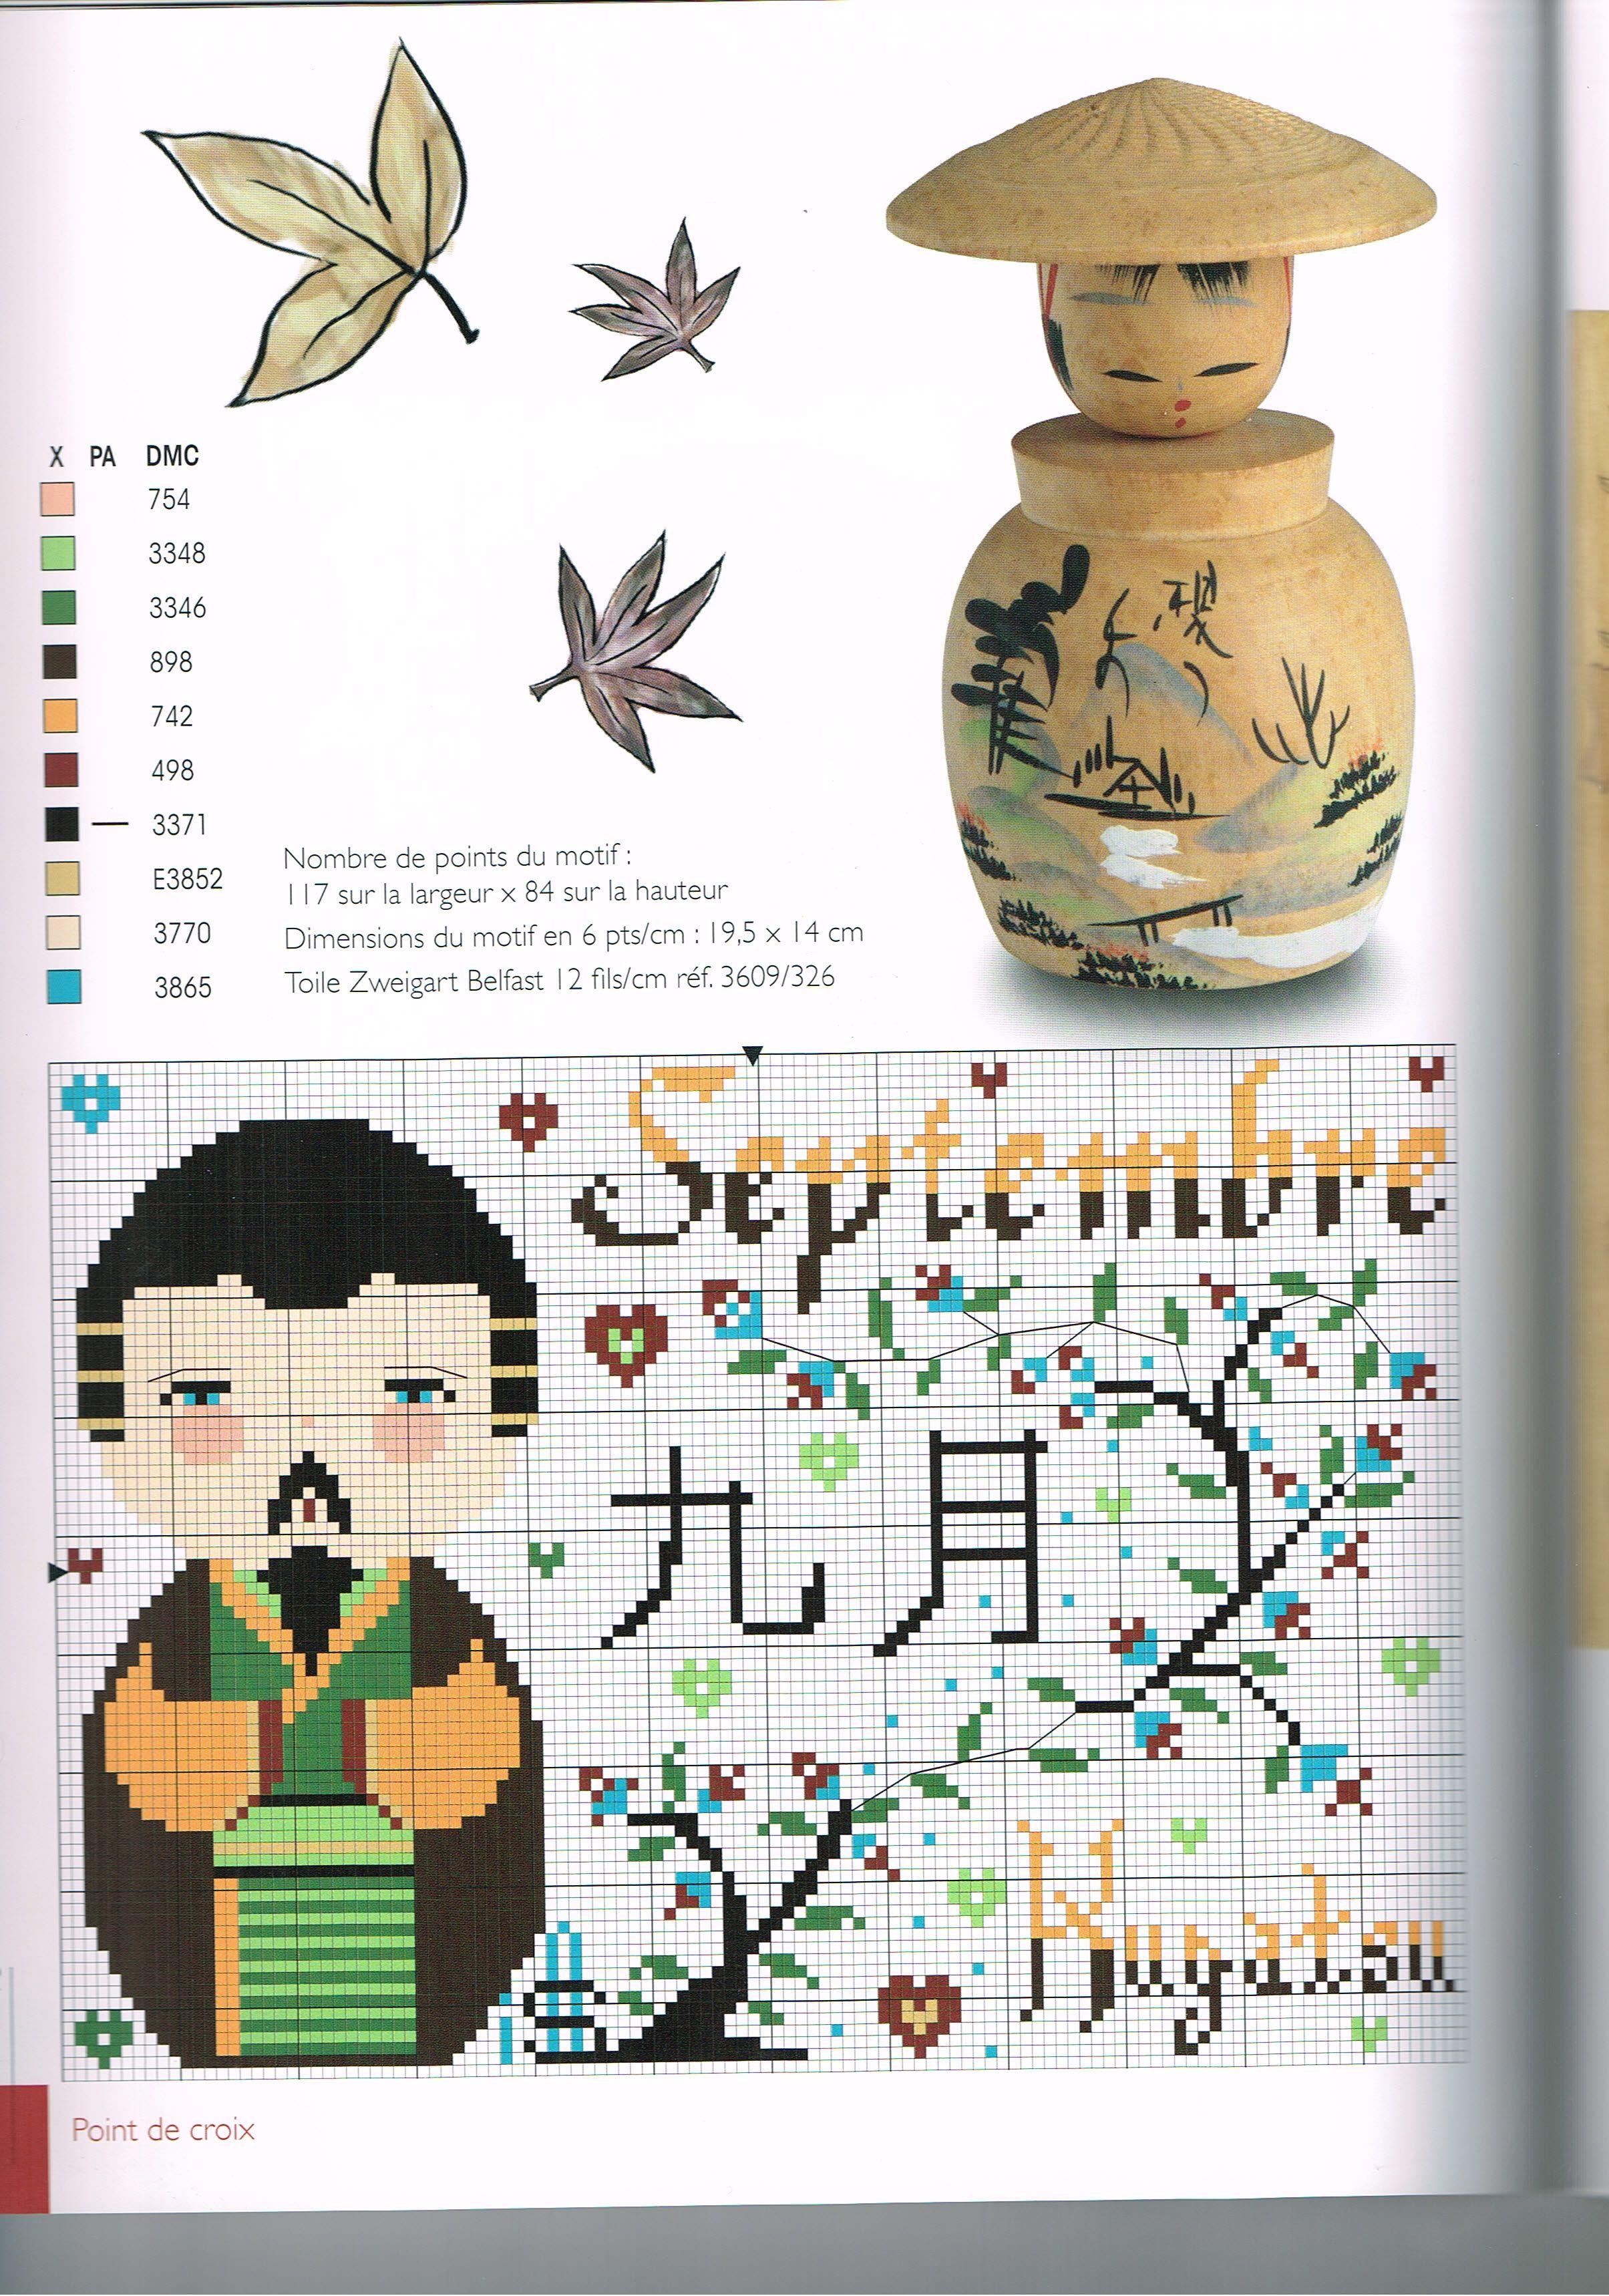 grille septembre 2/2 | Oriental Pto X